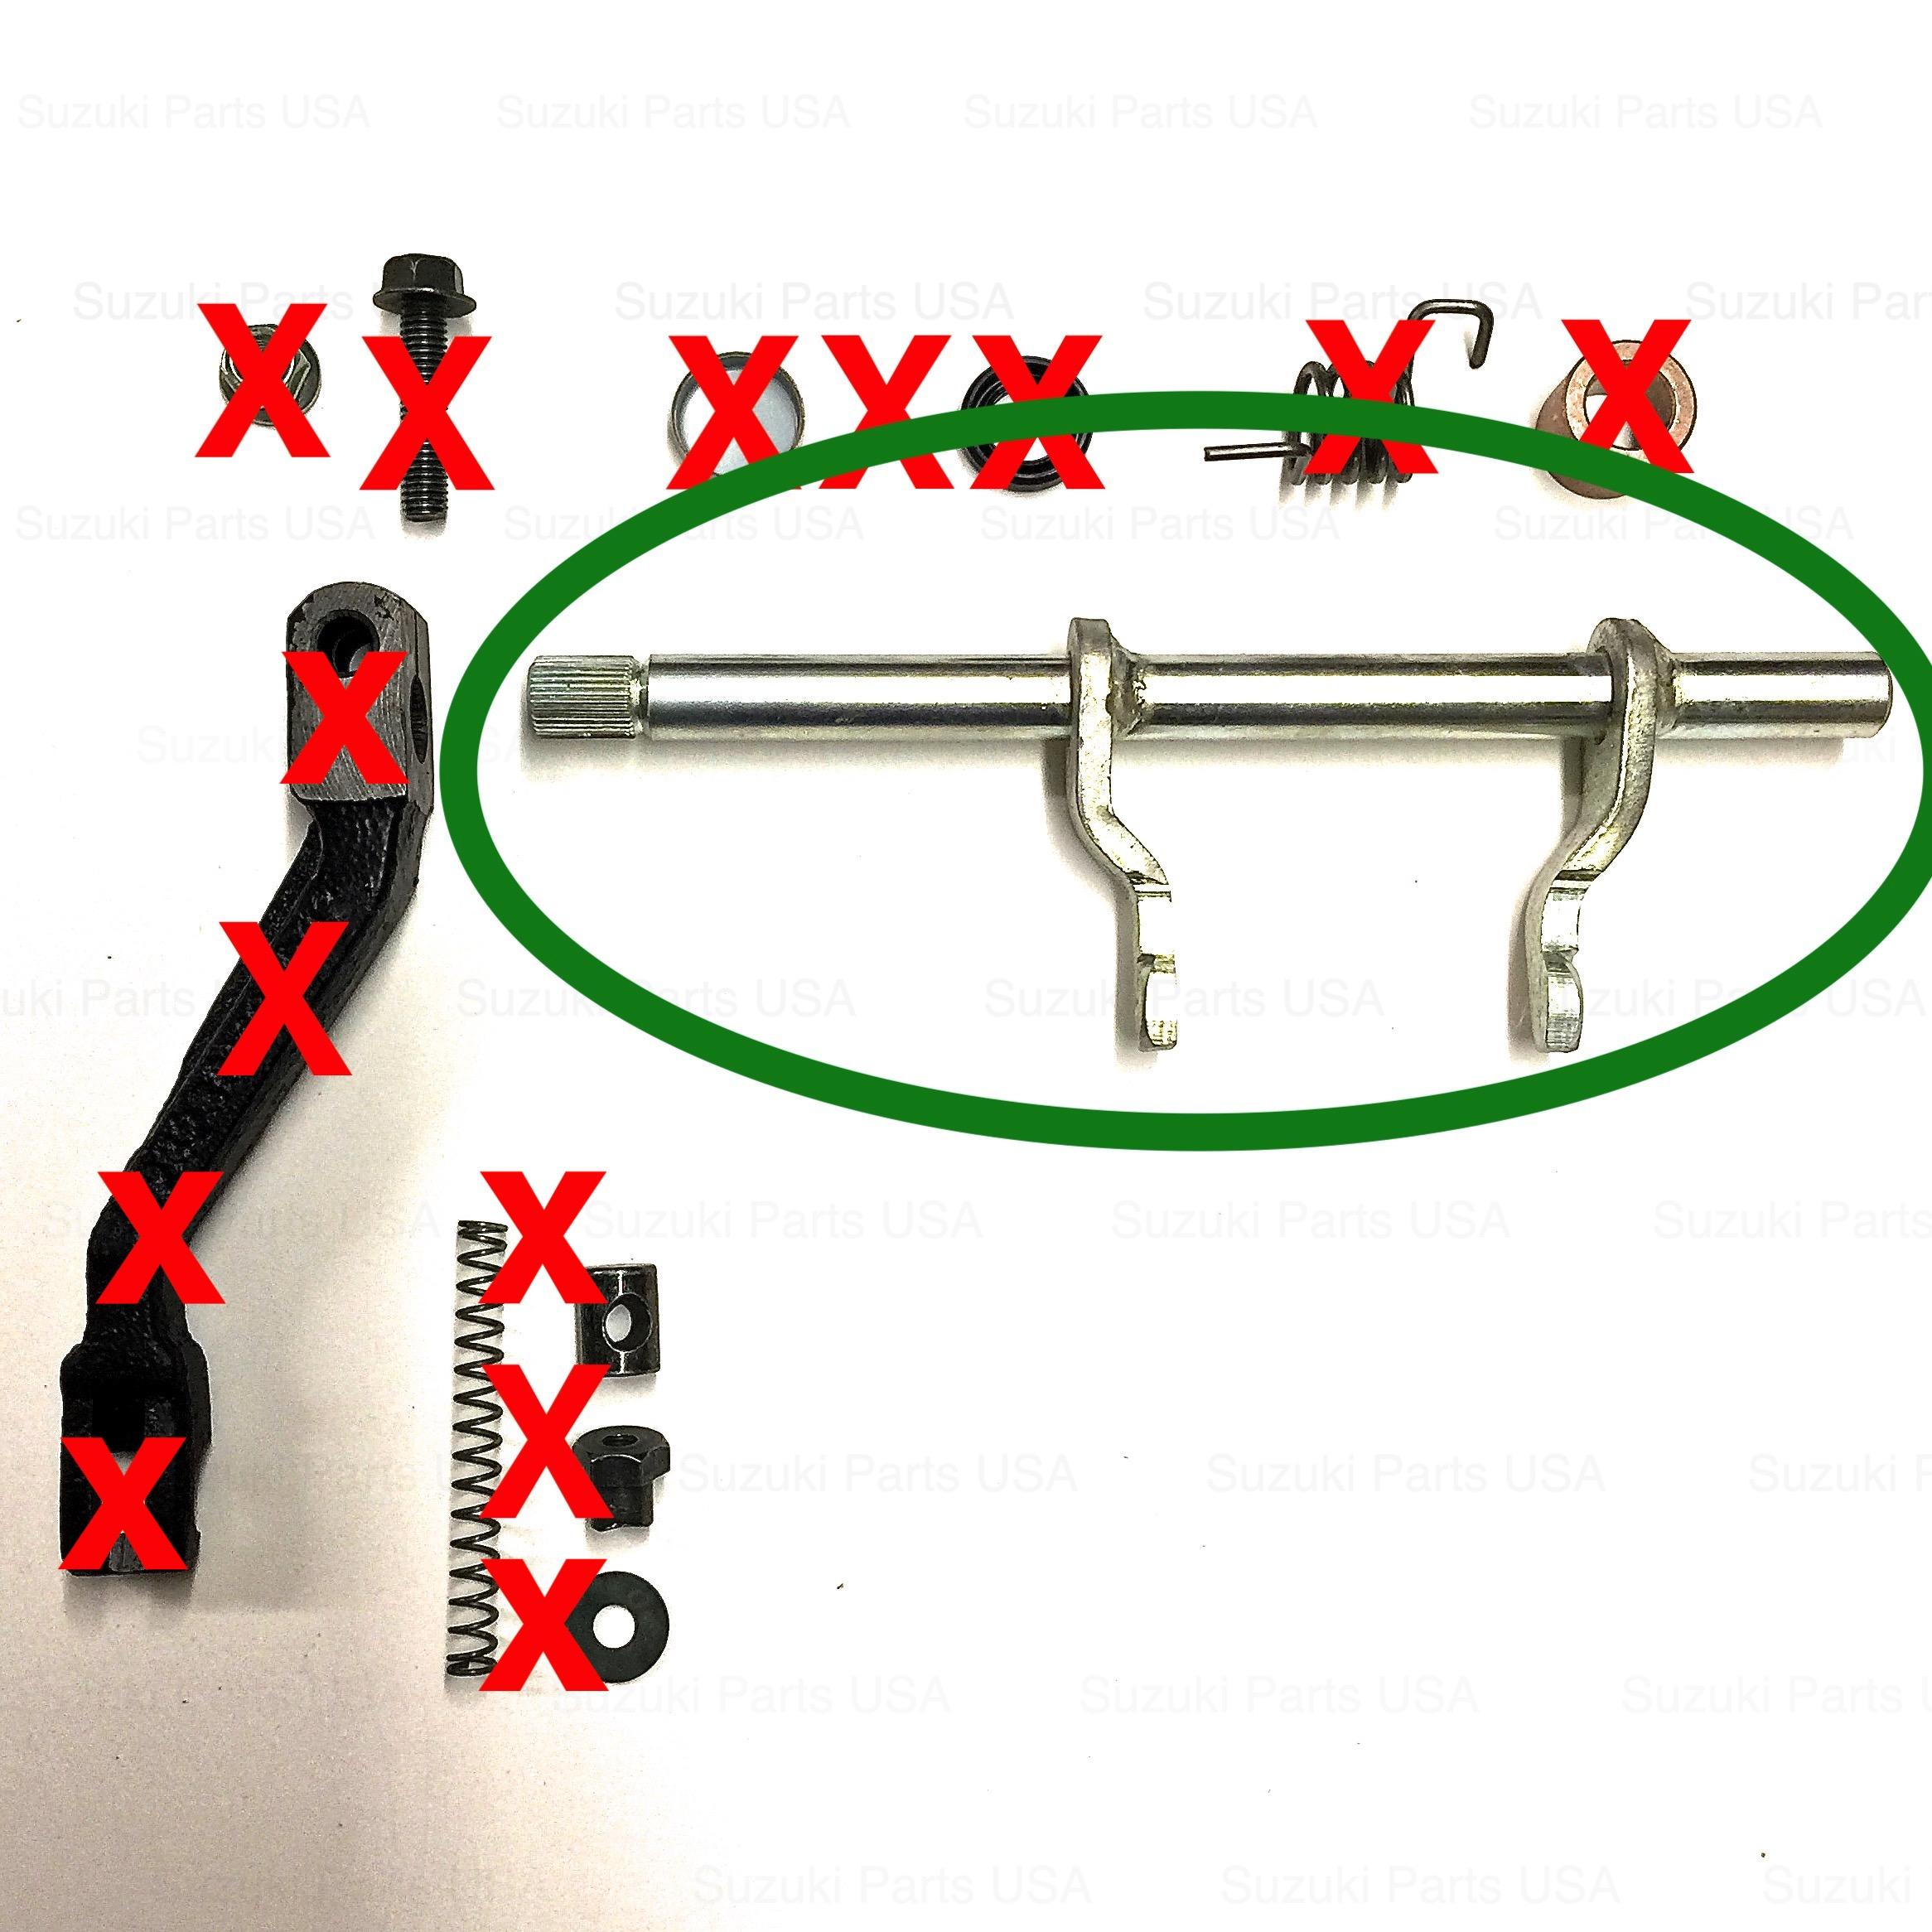 CLUTCH RELEASE ARM - OEM Transmission SJ413 Suzuki Samurai 86-95  ATL,GA